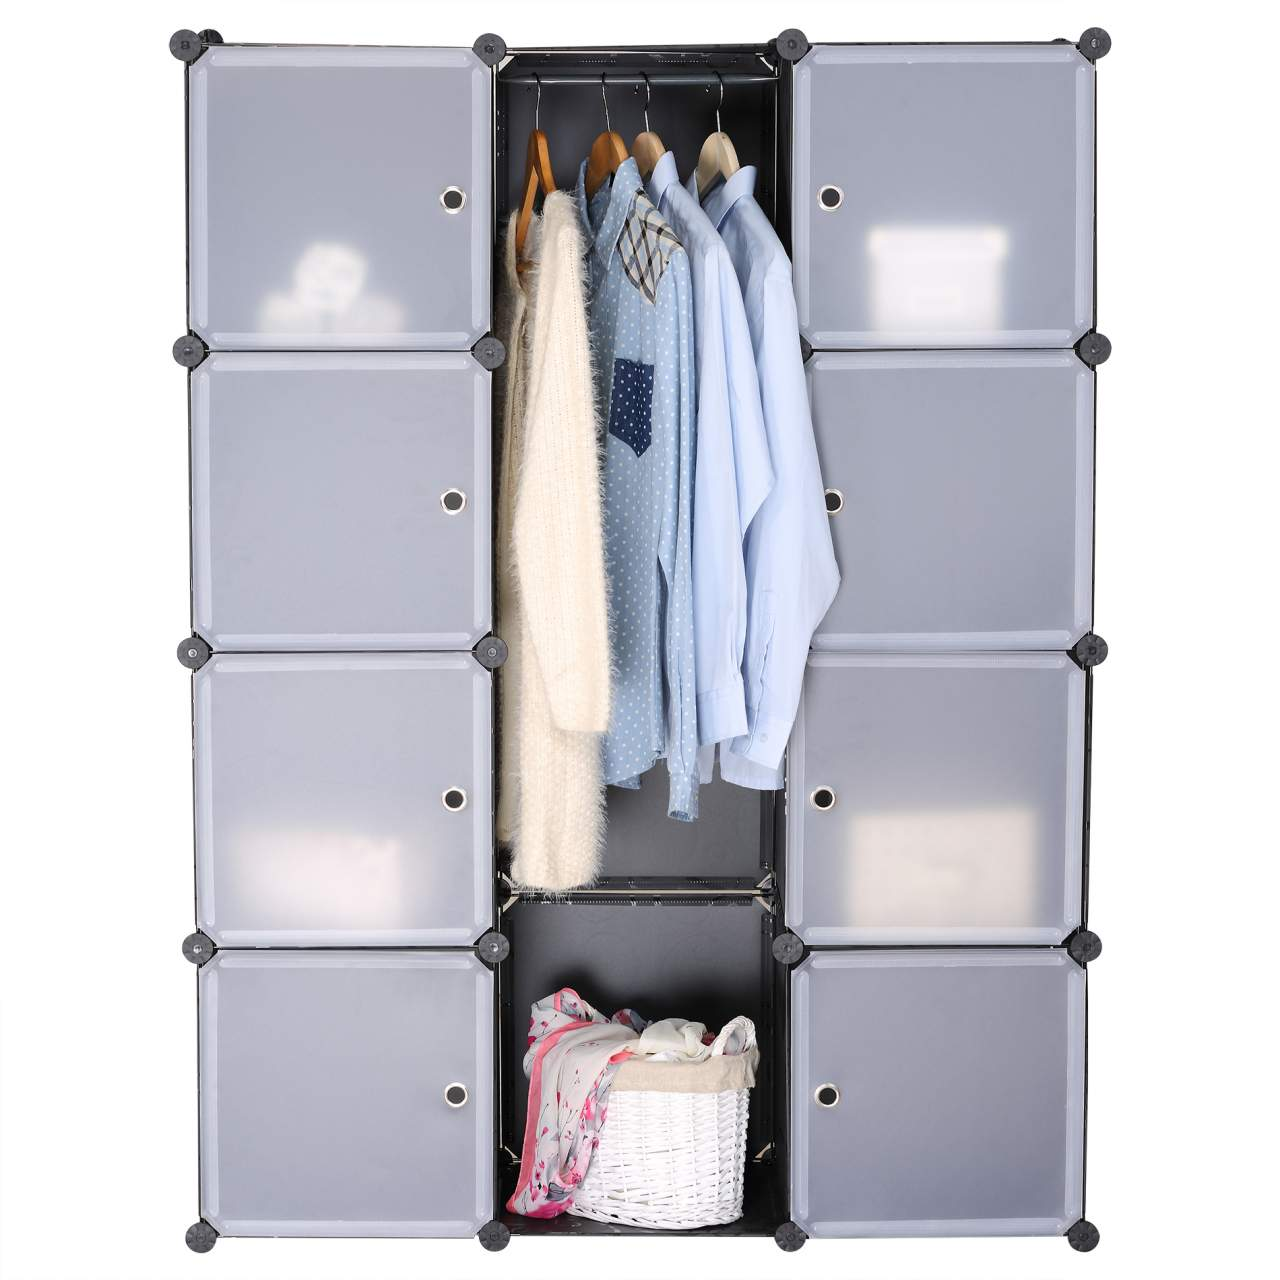 Shelf System Wardrobe With Doors Black Sr0012 Woltu Eu